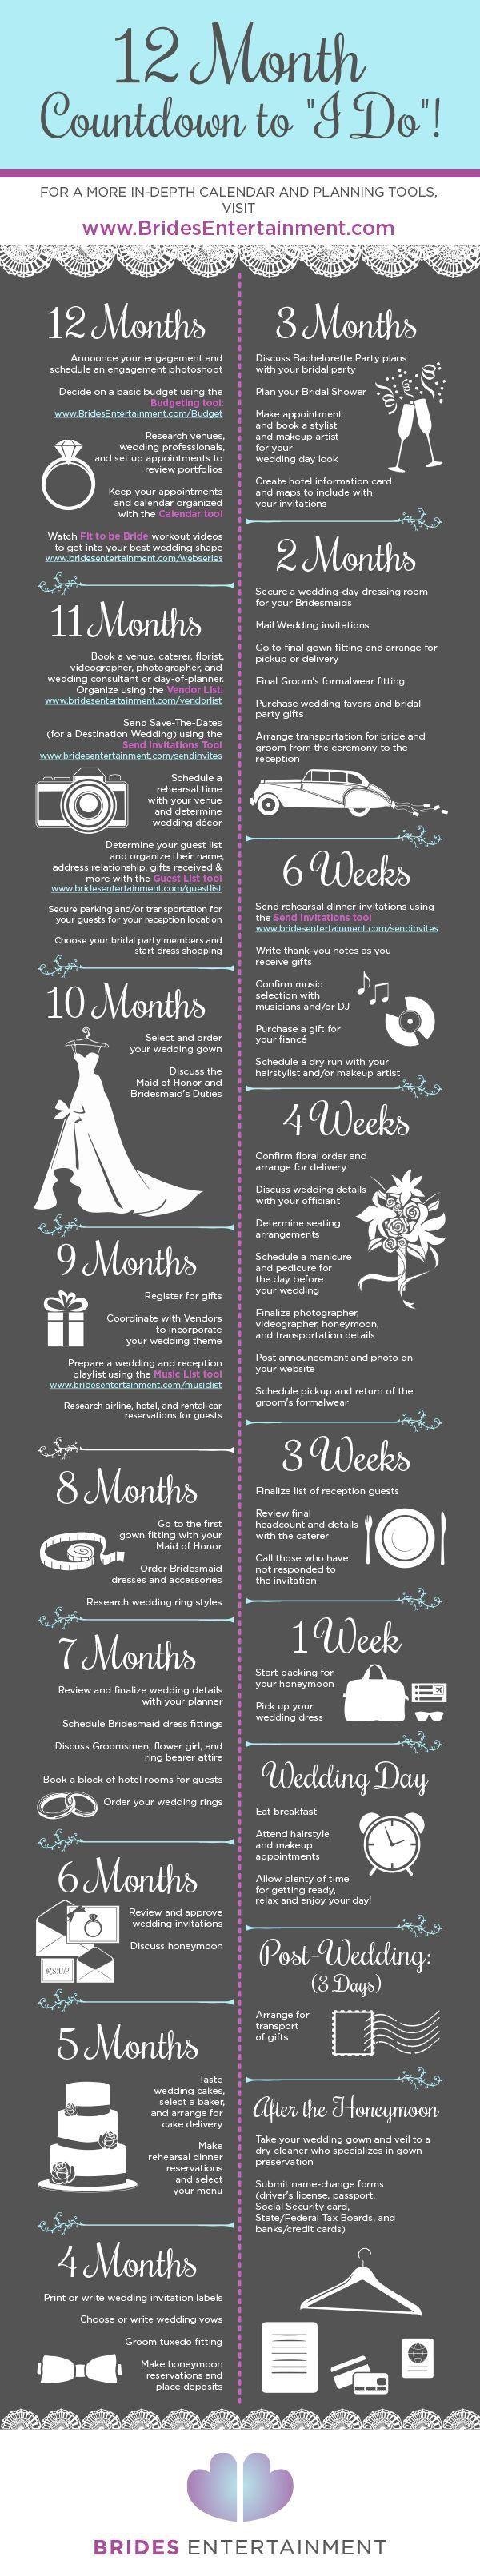 3 month wedding planning timeline